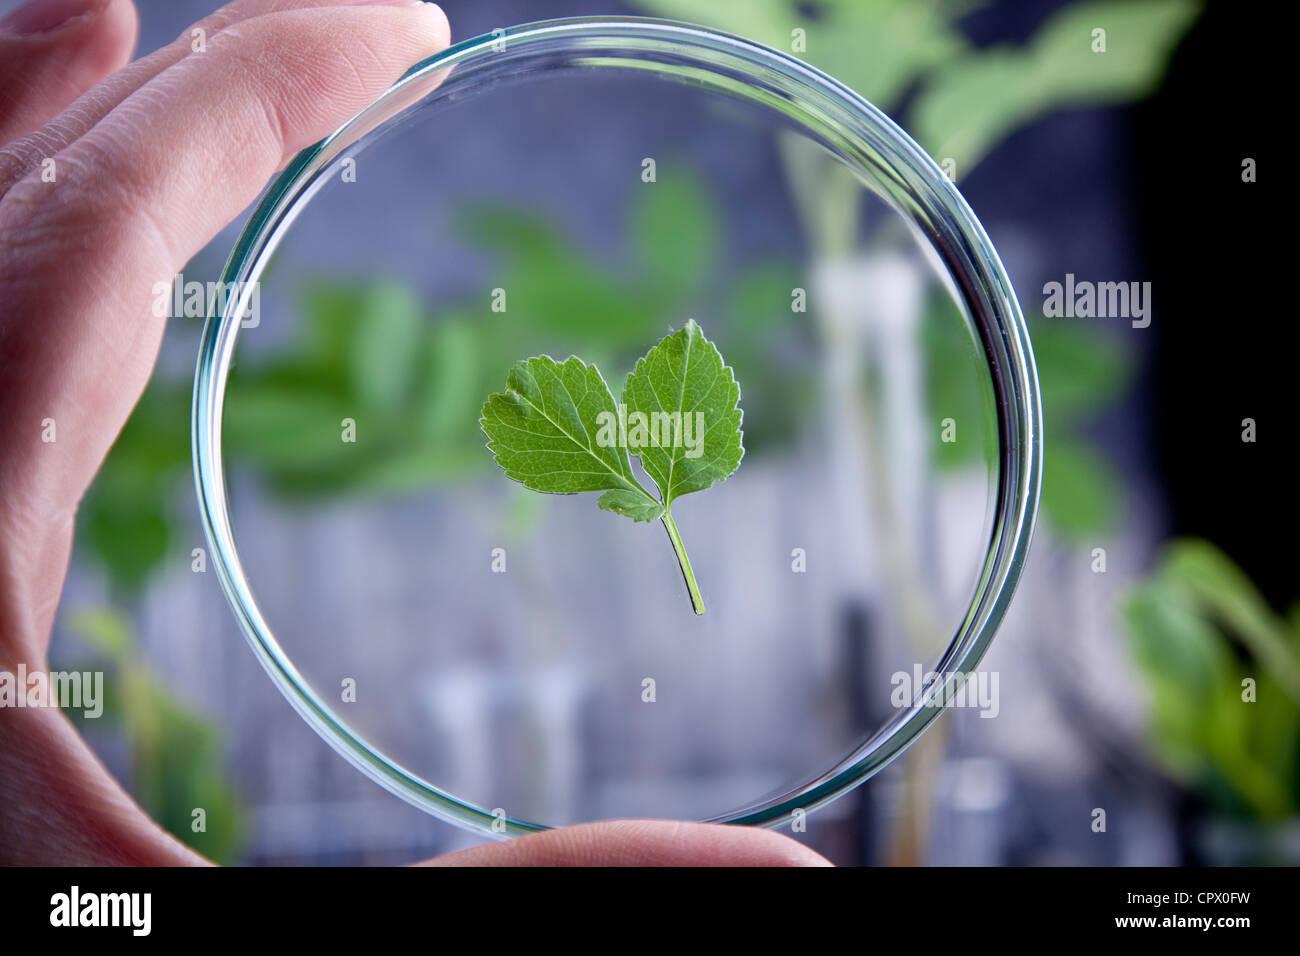 Laboratory glassware, experiments on plants - Stock Image